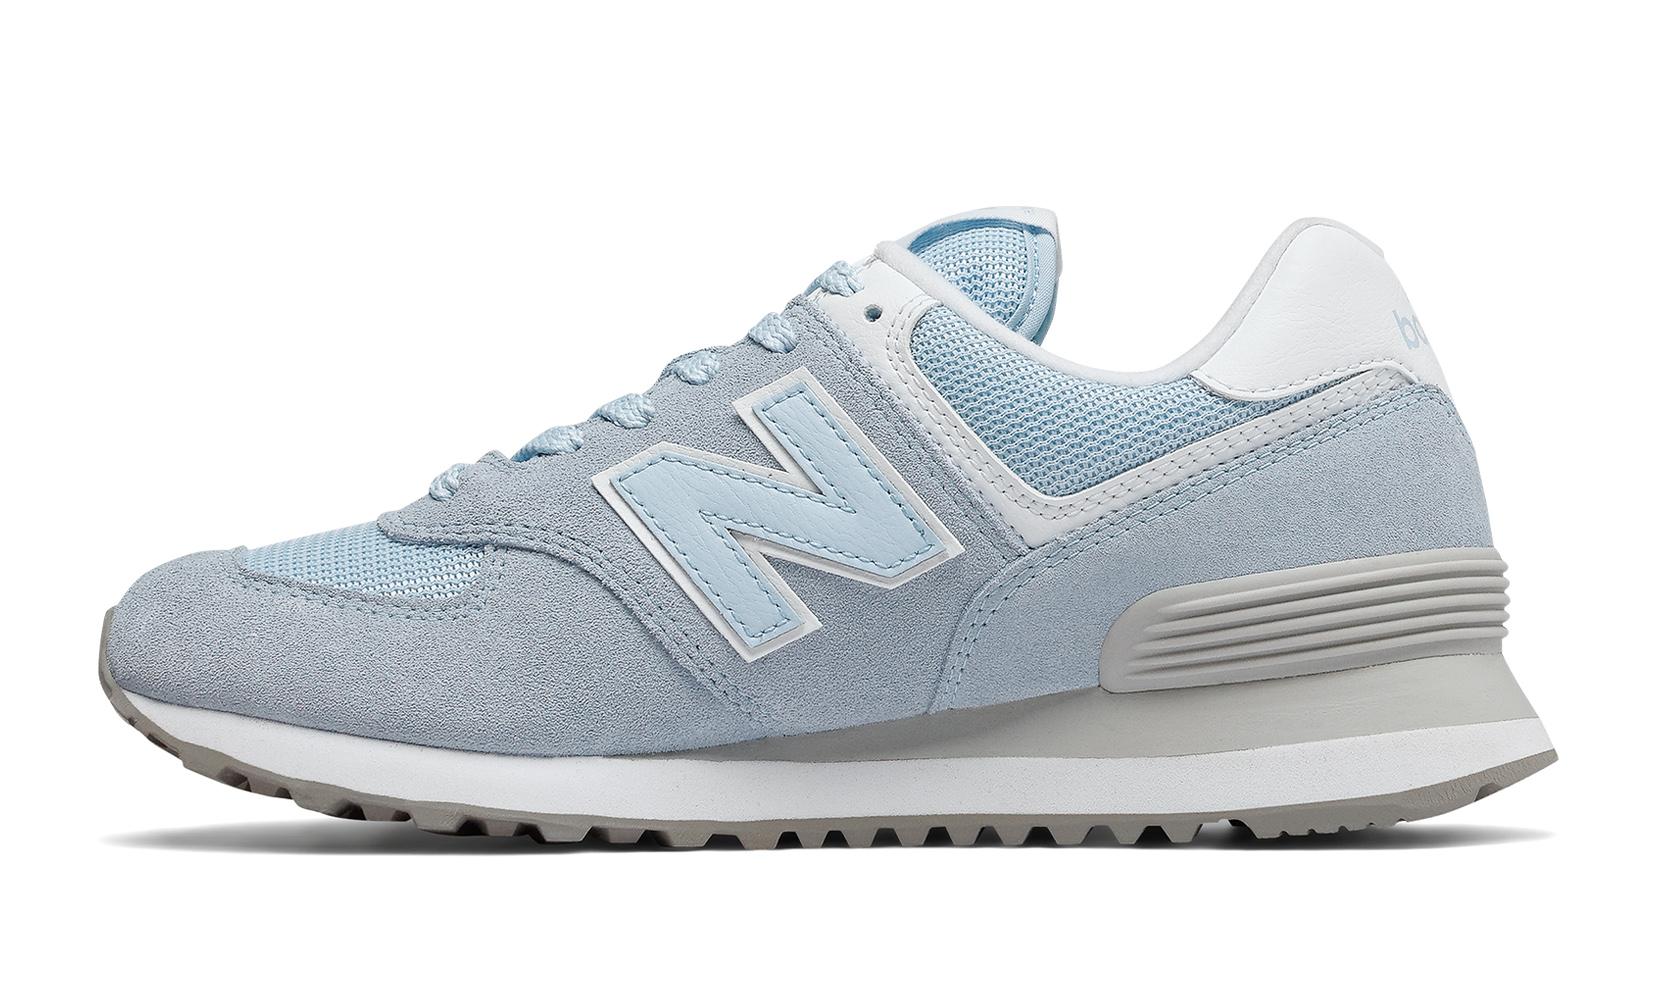 Жіноче взуття повсякденне New Balance 574 WL574ESC | New Balance